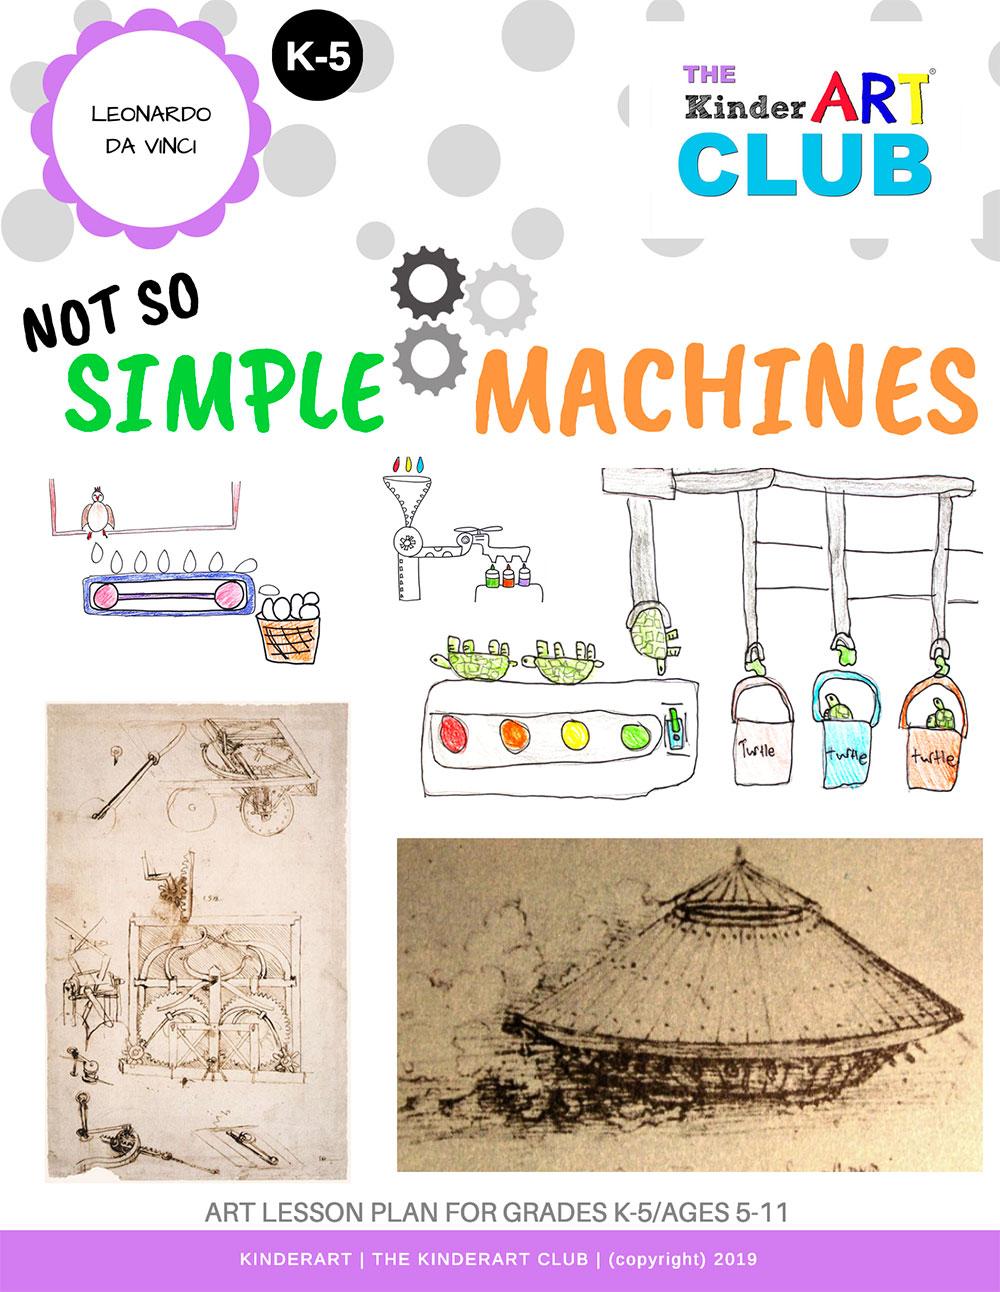 leonardo_simple_machines